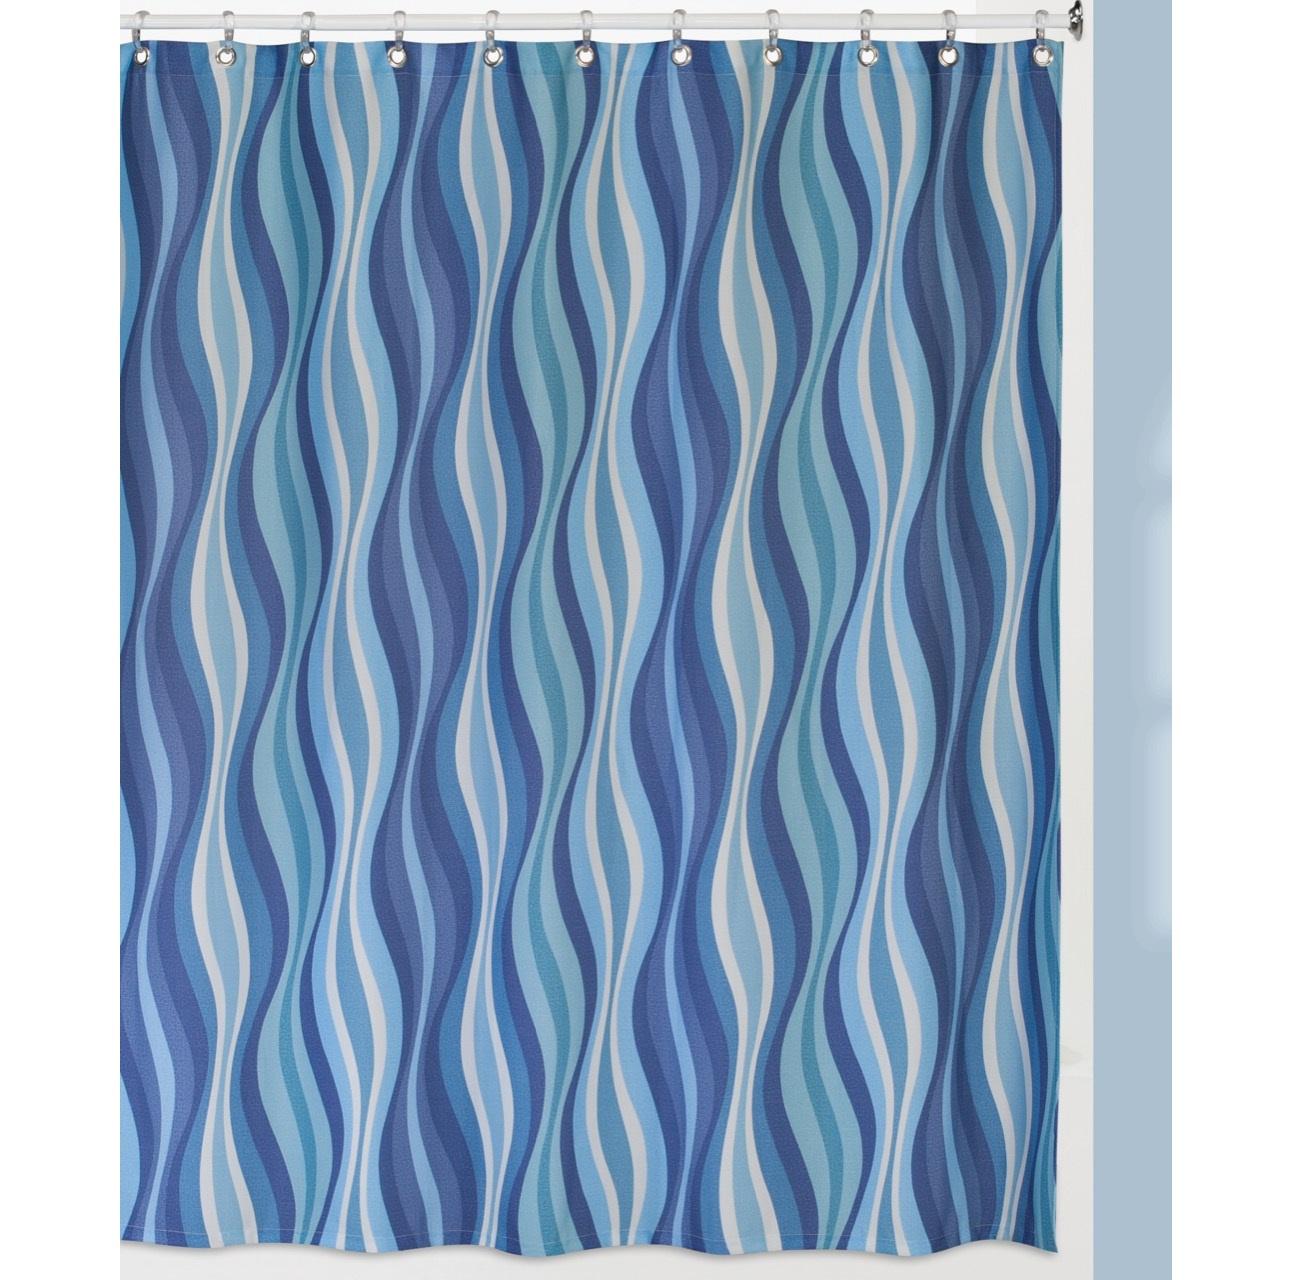 Штора для ванной Creative Bath Wavelength, синий, голубой sartoria campo napoli pубашка